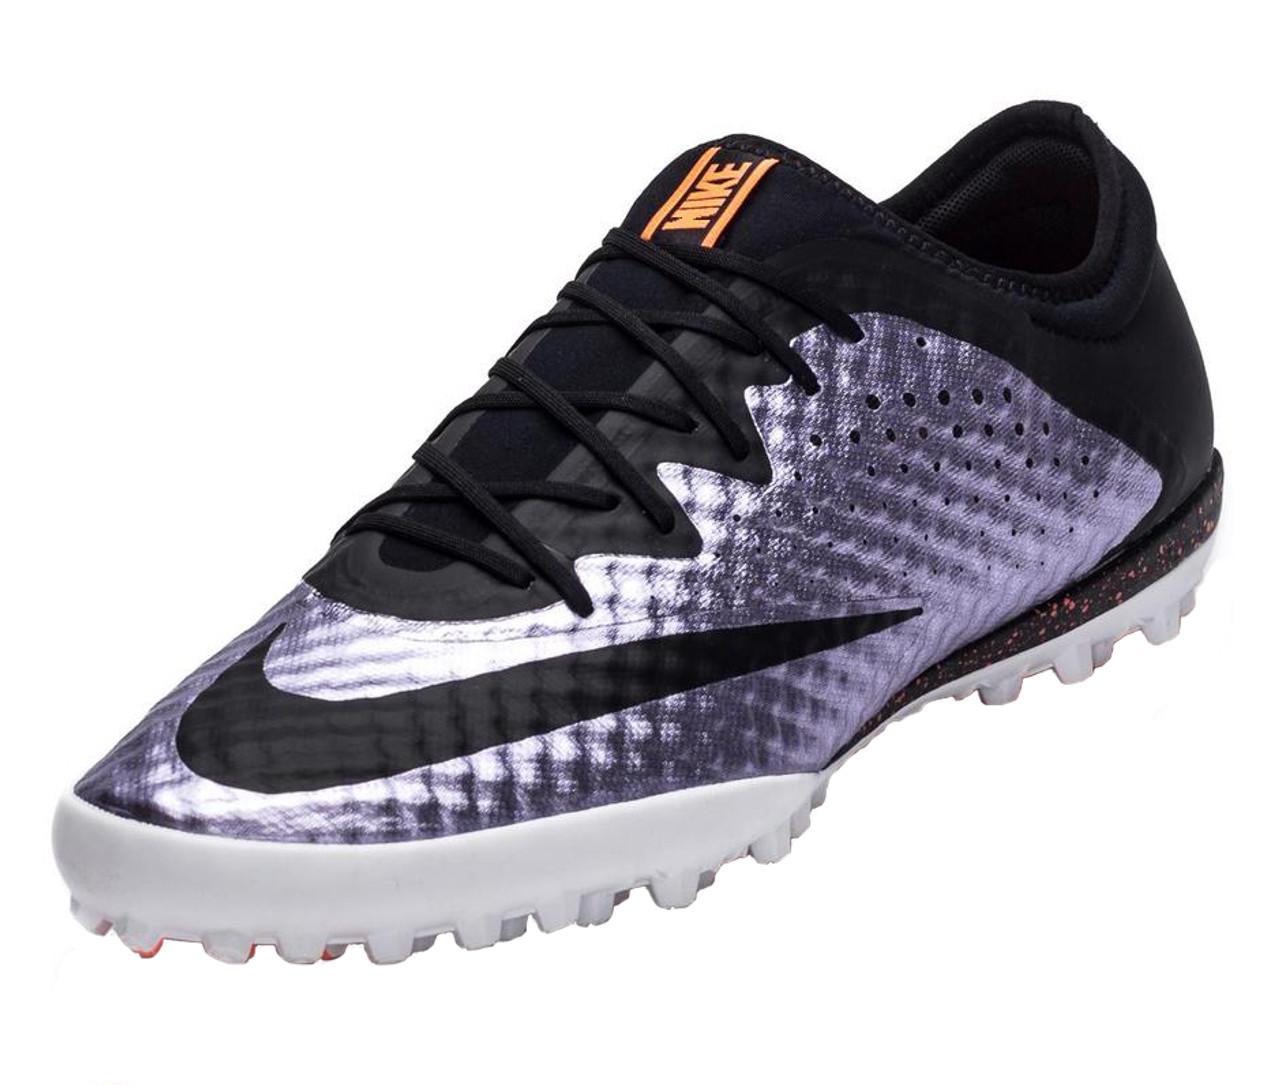 Nike Mercurial X Finale TF - Urban Lilac Black - ohp soccer 97d1ee52d4